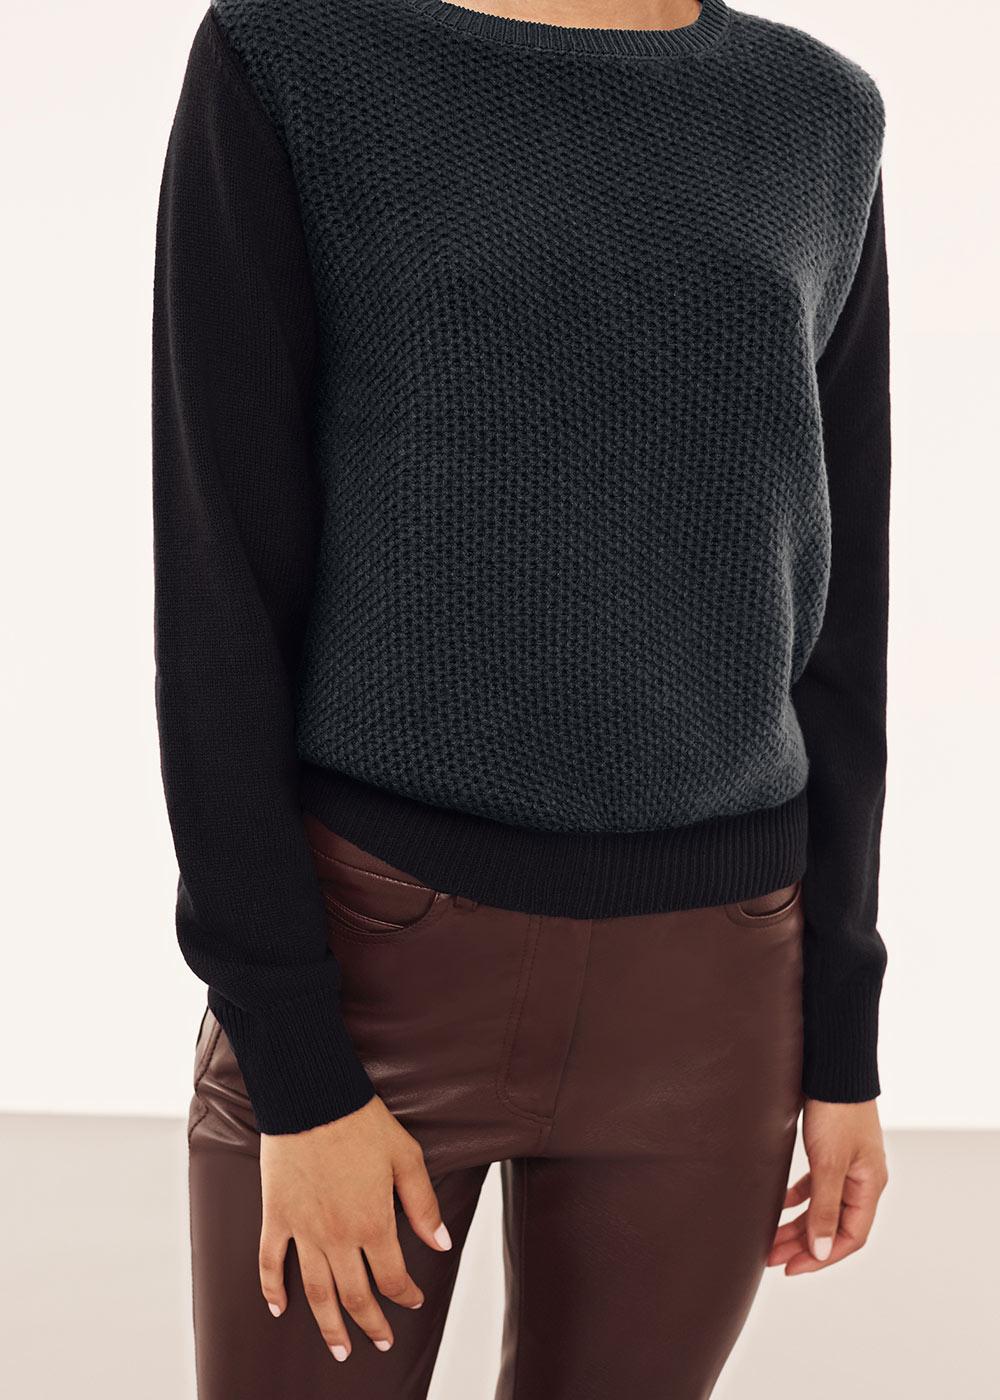 Cashmere colour blocked crewneck sweater - Alexander Lewis